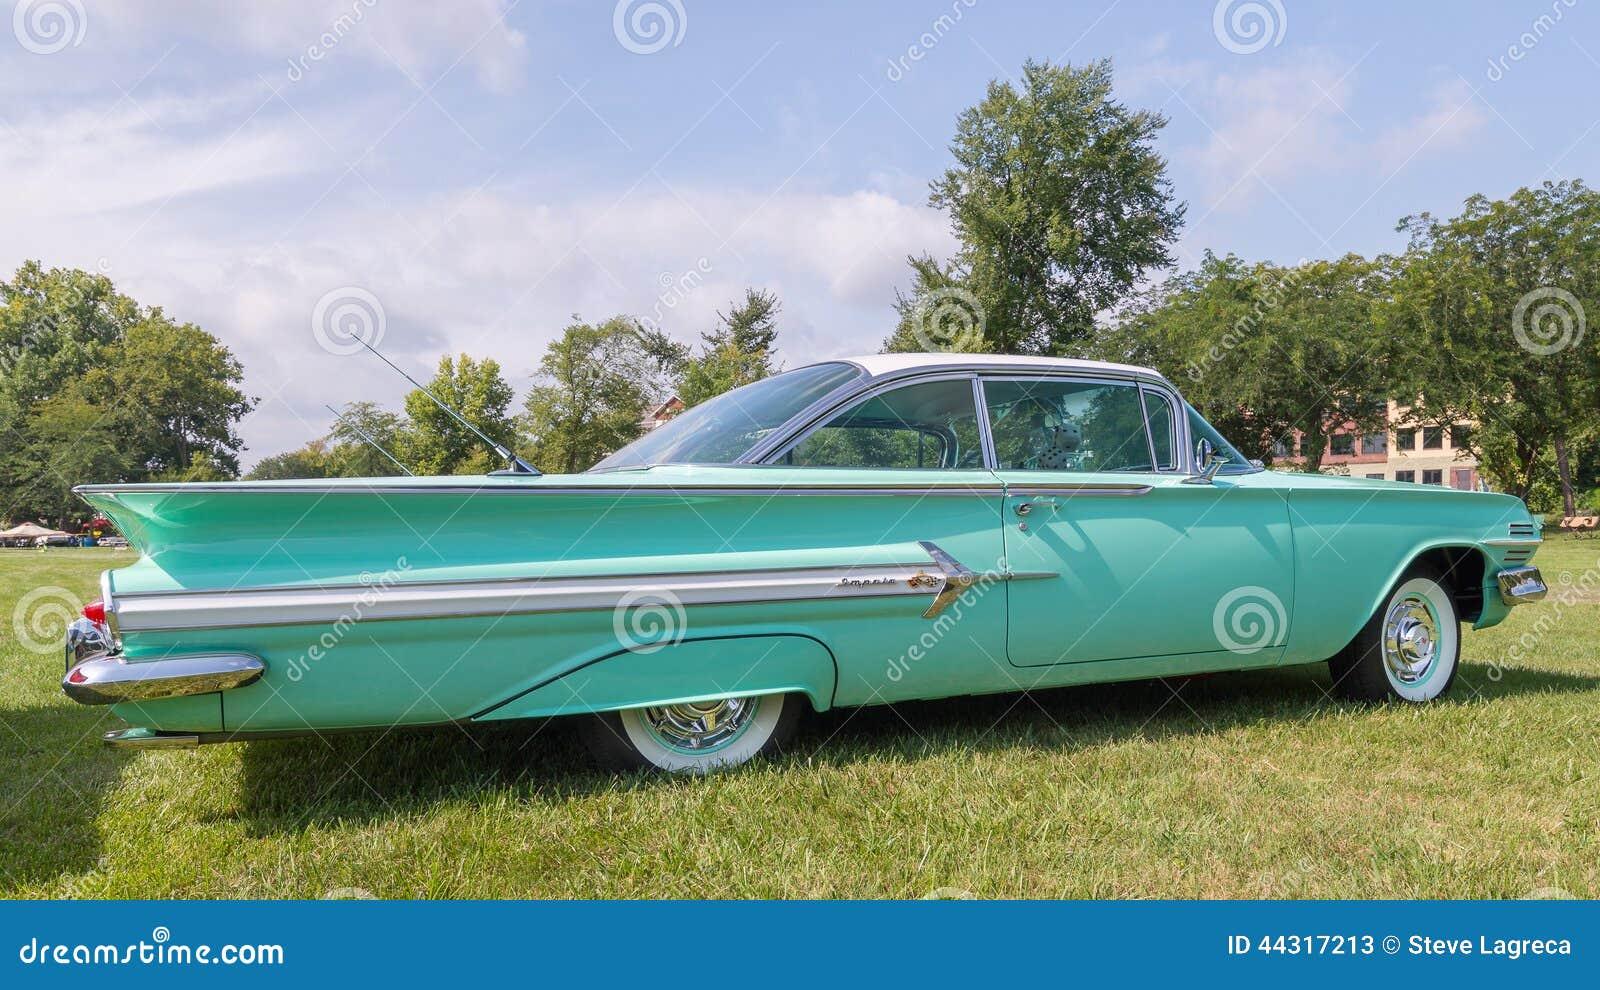 1959 60 Chevrolet Impala Editorial Stock Photo Image Of 1959 44317213